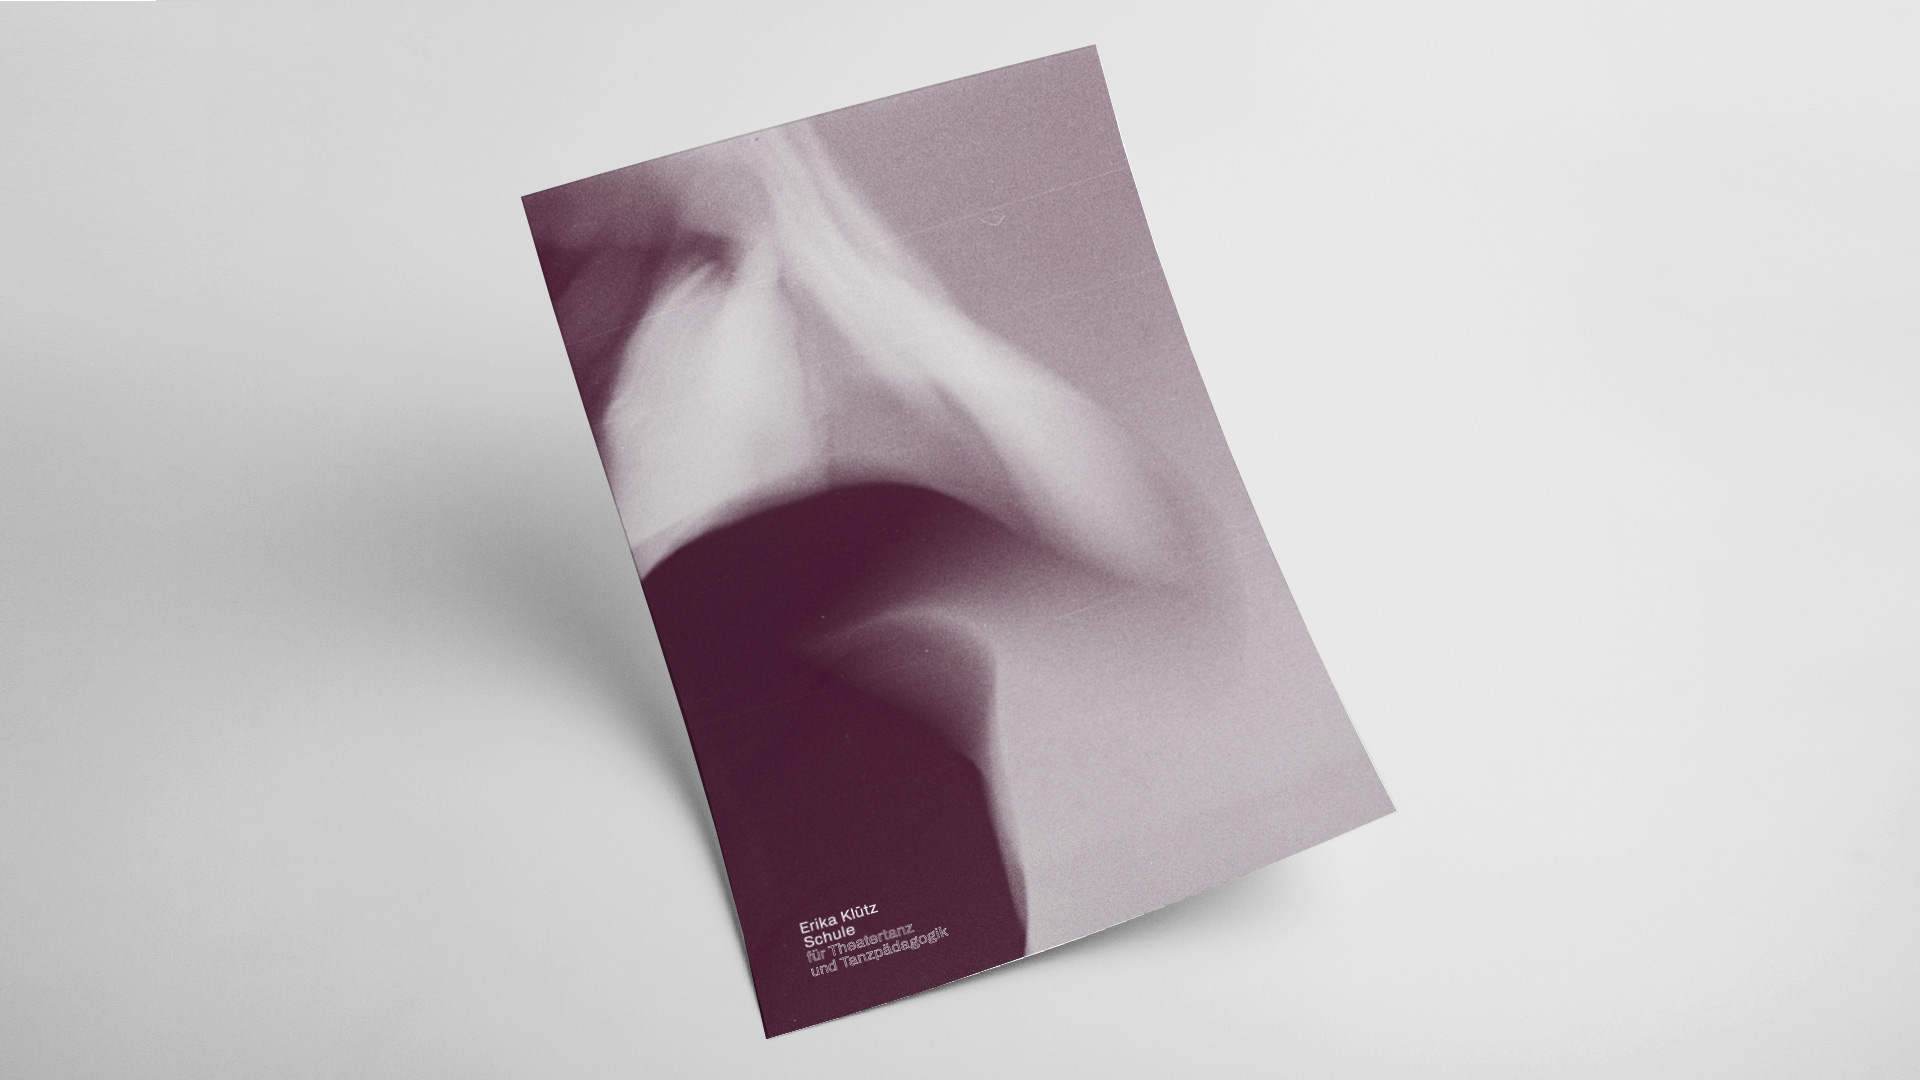 Erika-Kluetz-Schule-Briefpapier-01-MOCK